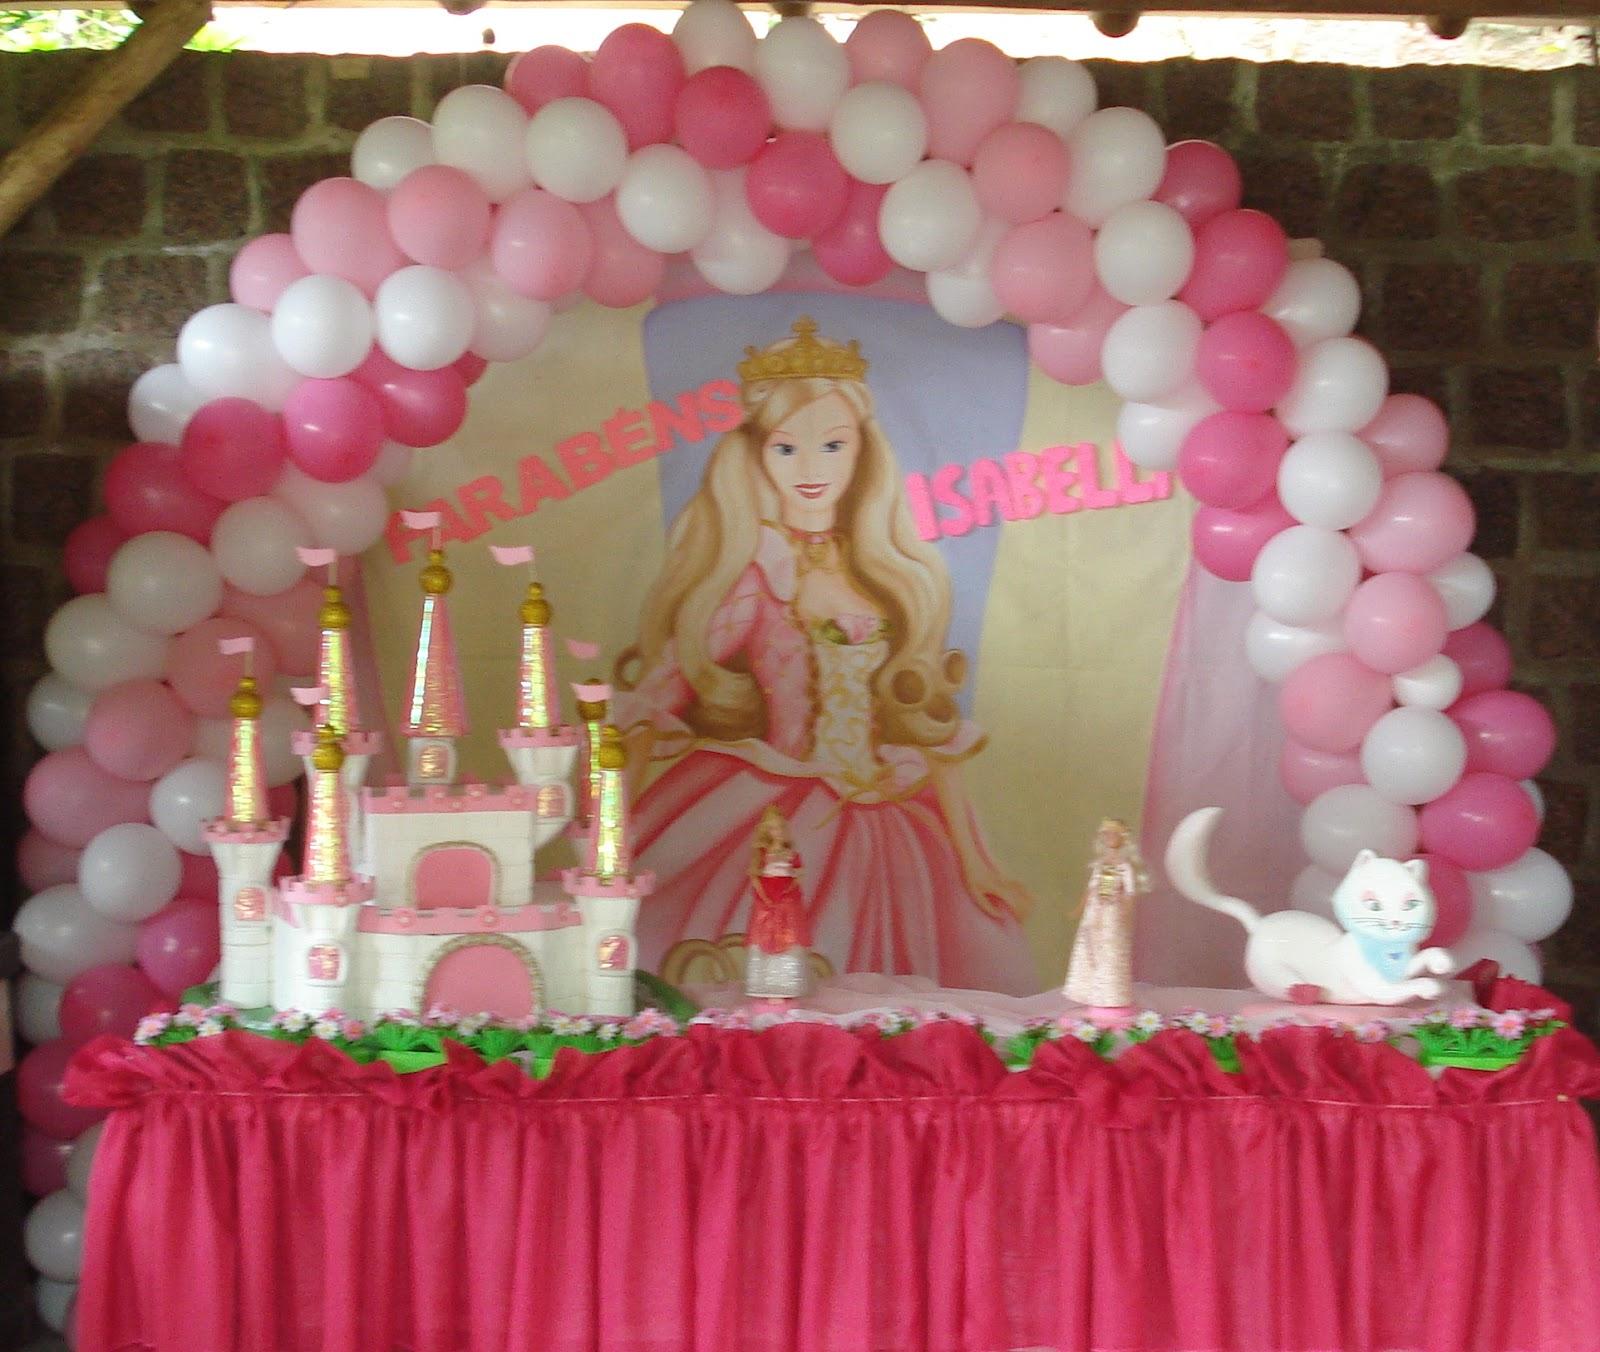 decoracao festa barbie : decoracao festa barbie:Decoracao De Festa Infantil Princesa